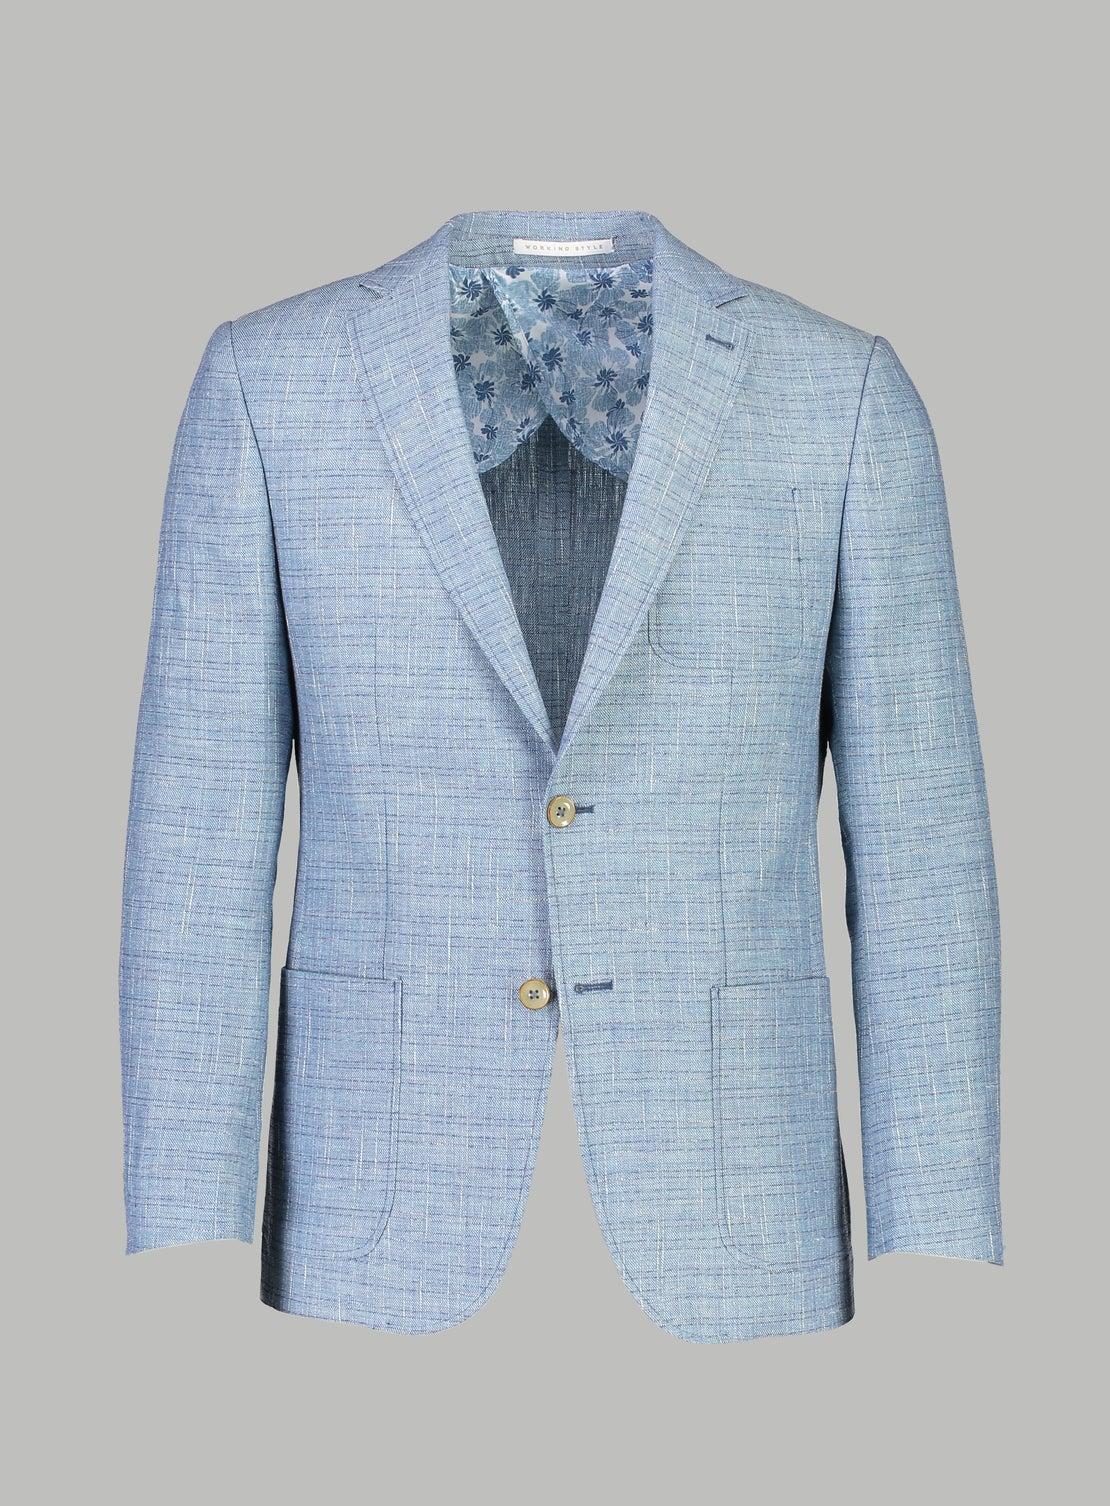 Franklin Powder Blue Check Sportscoat